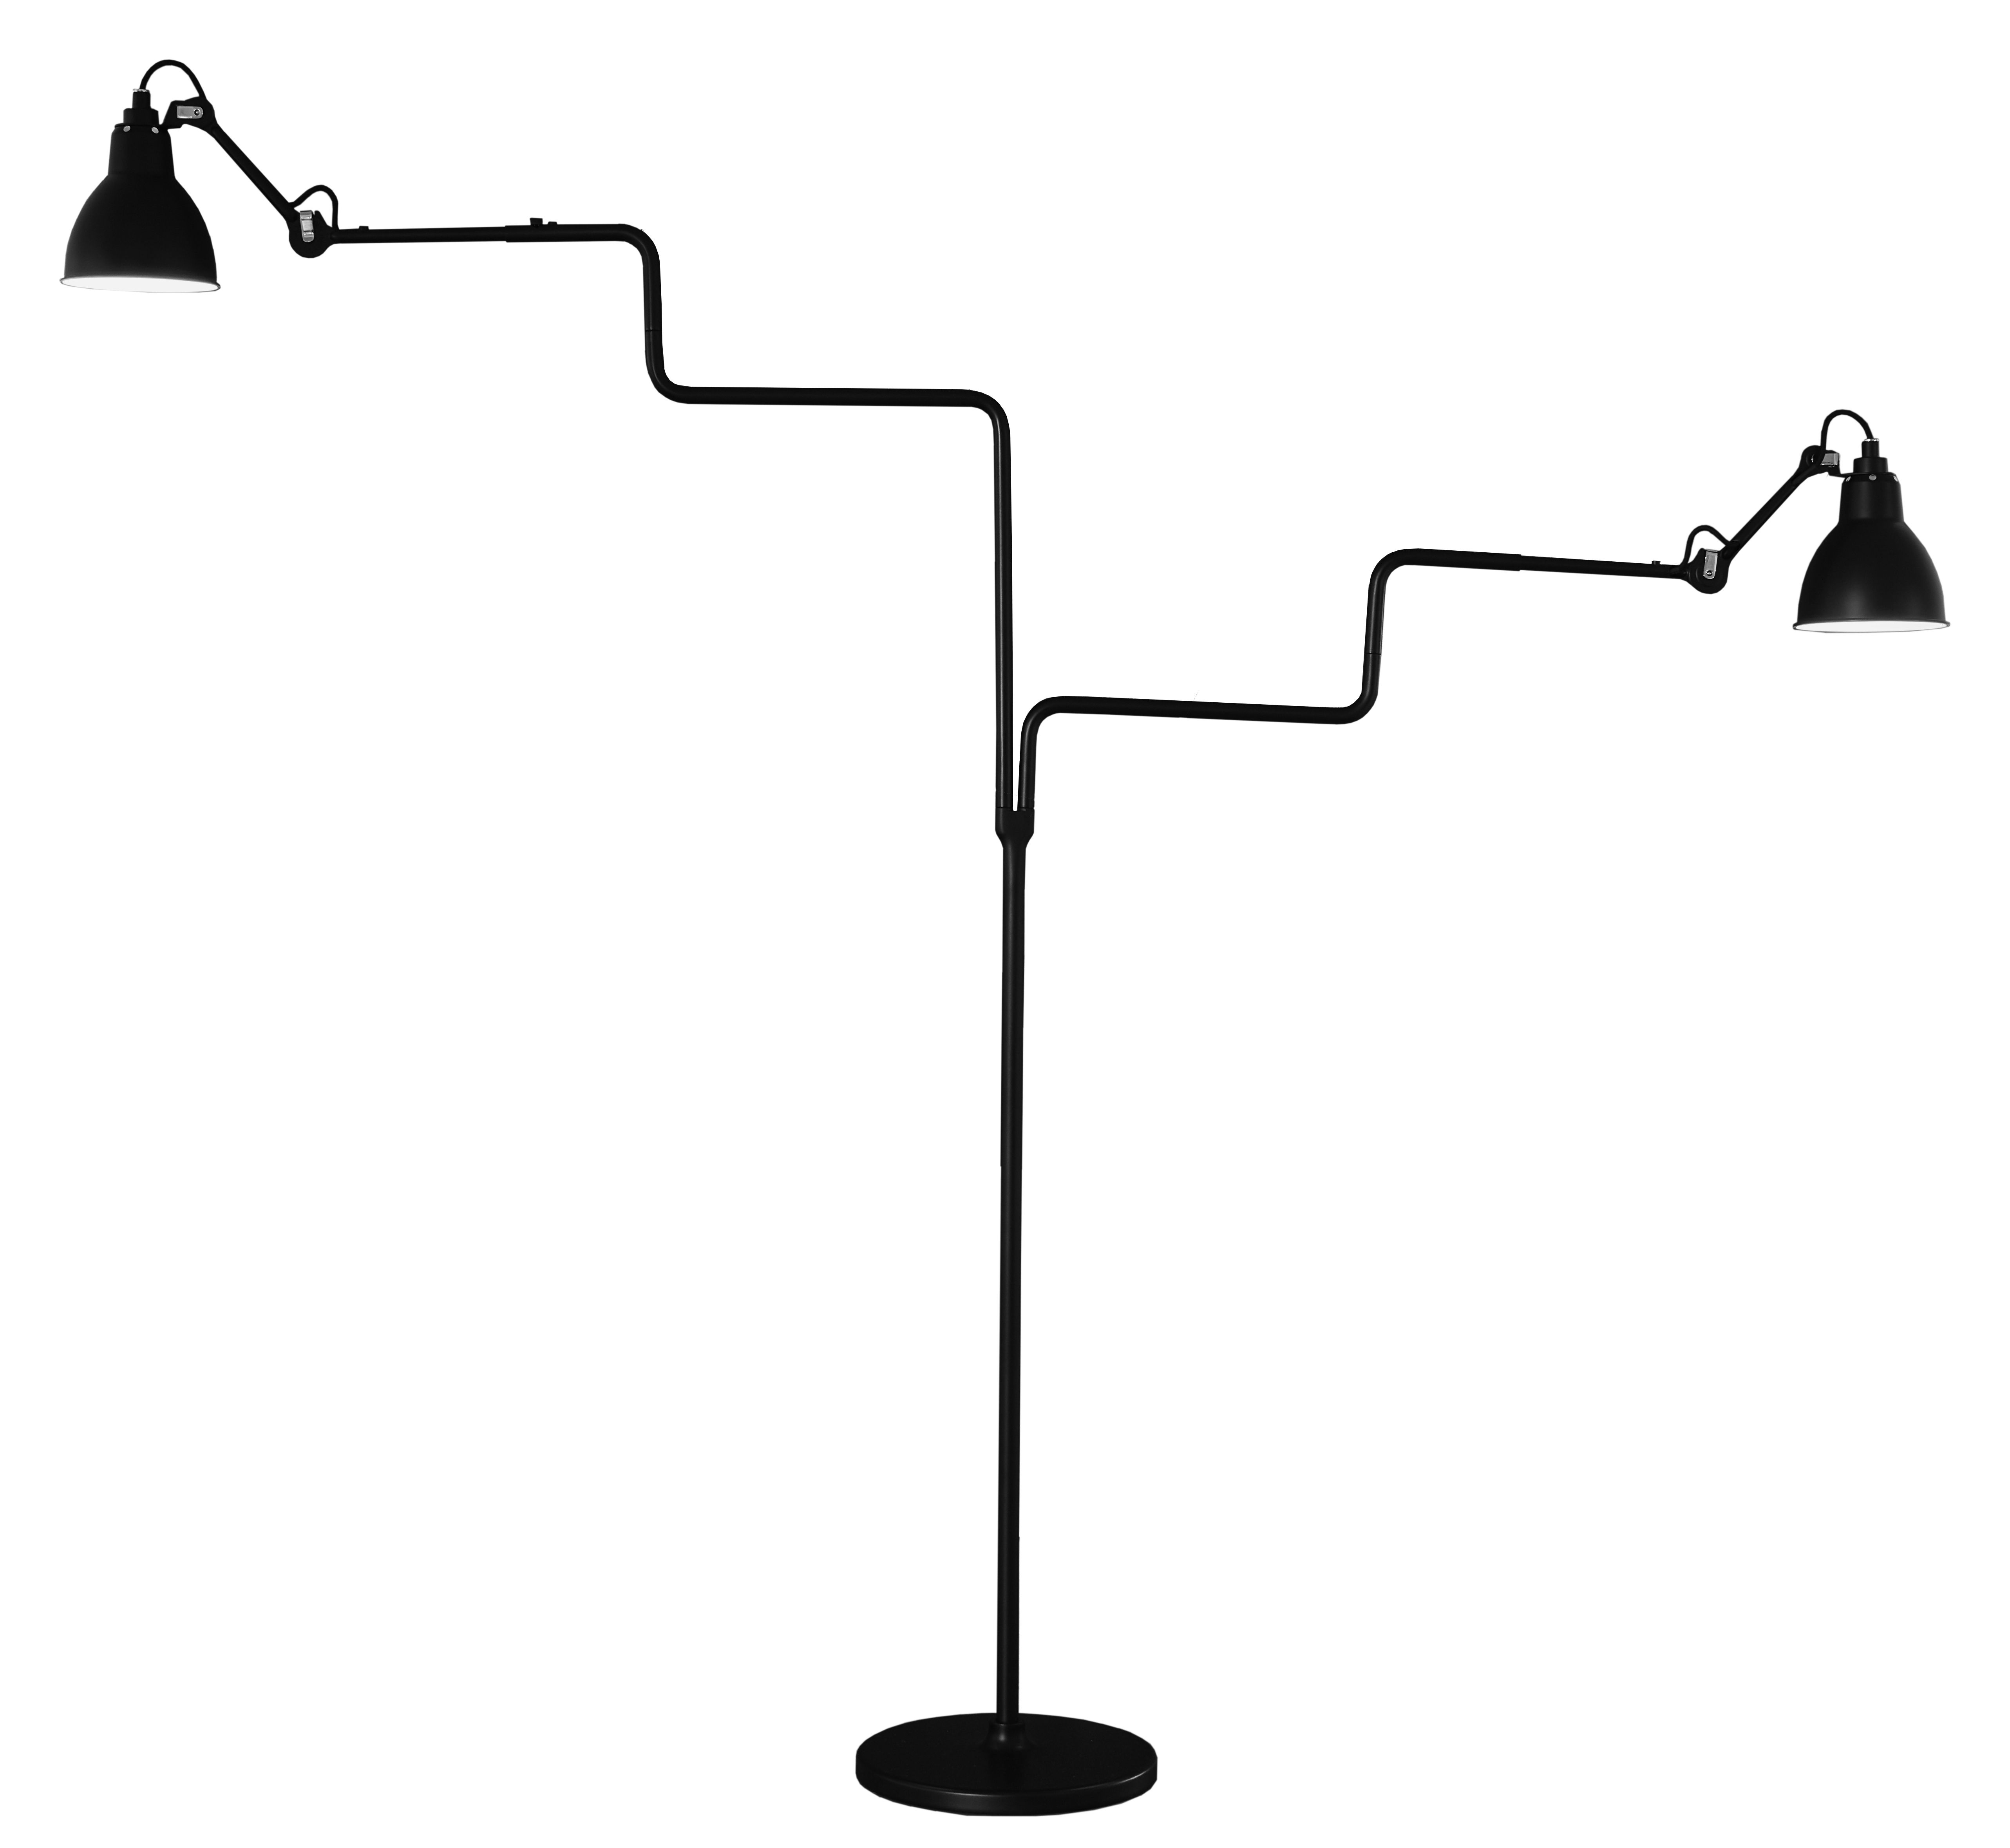 Lighting - Floor lamps - N° 411 Double Floor lamp - Lampe Gras by DCW éditions - Black satin - Aluminium, Steel